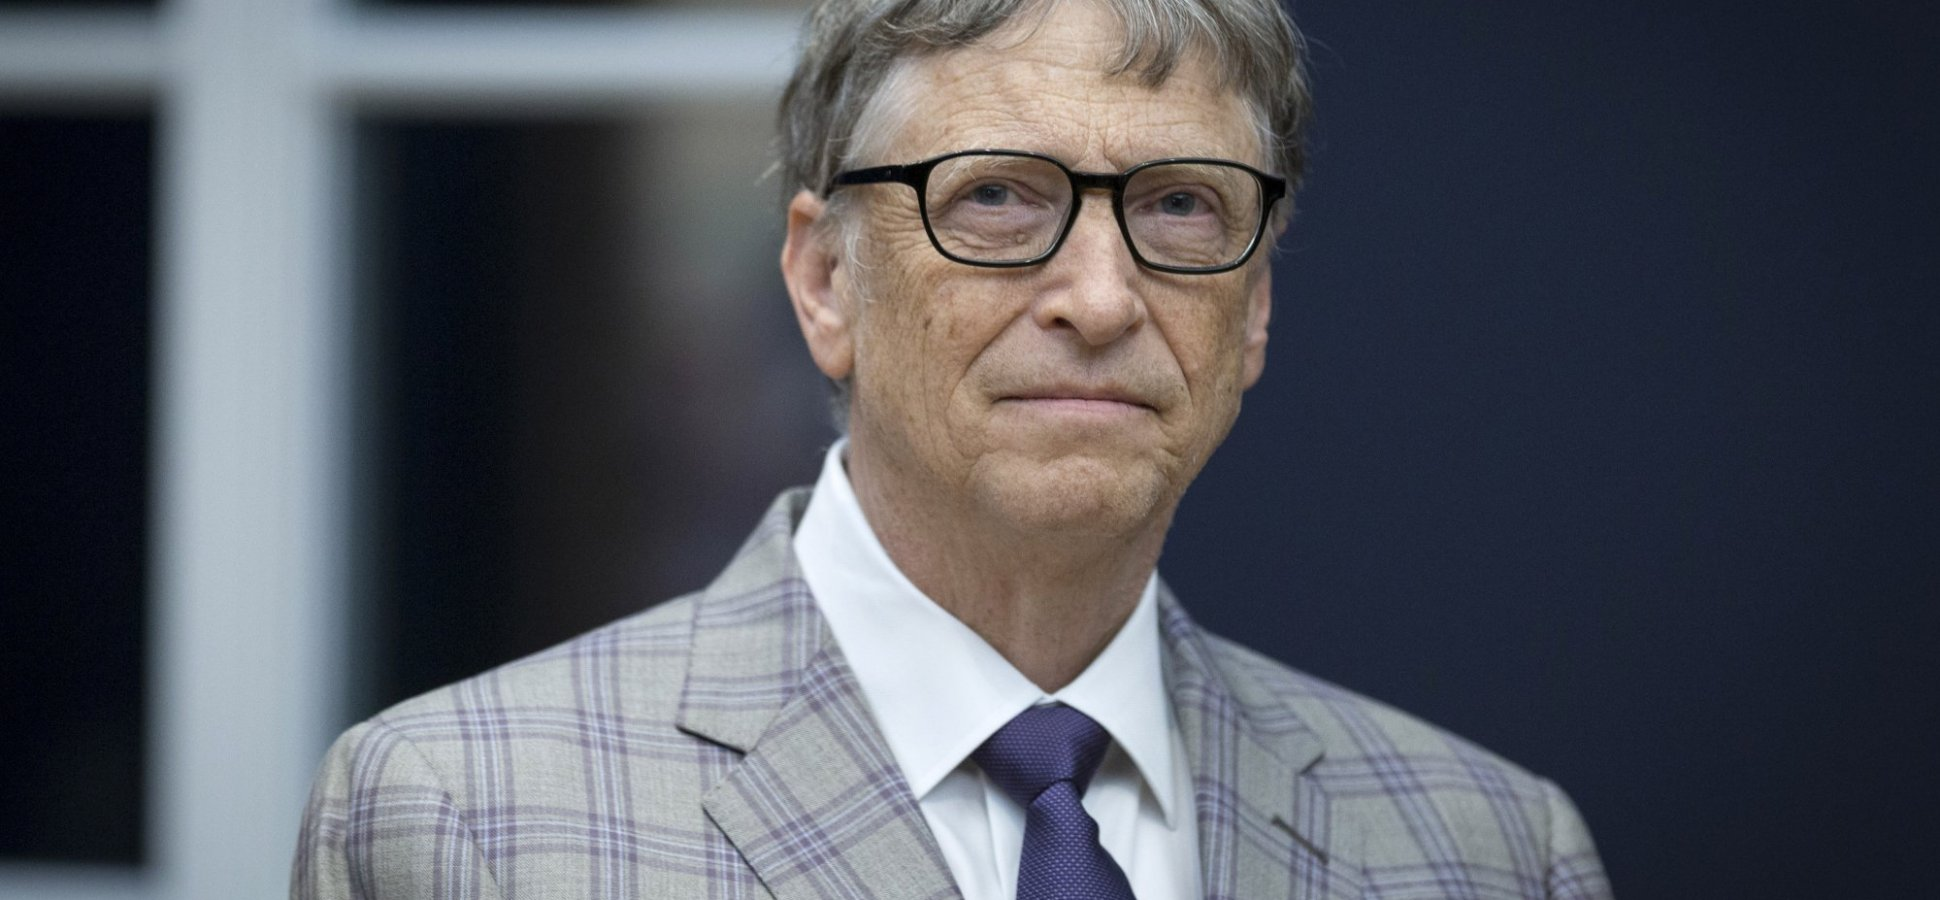 A Multi-billionaire's Suggestion For Avoiding His Biggest Regret